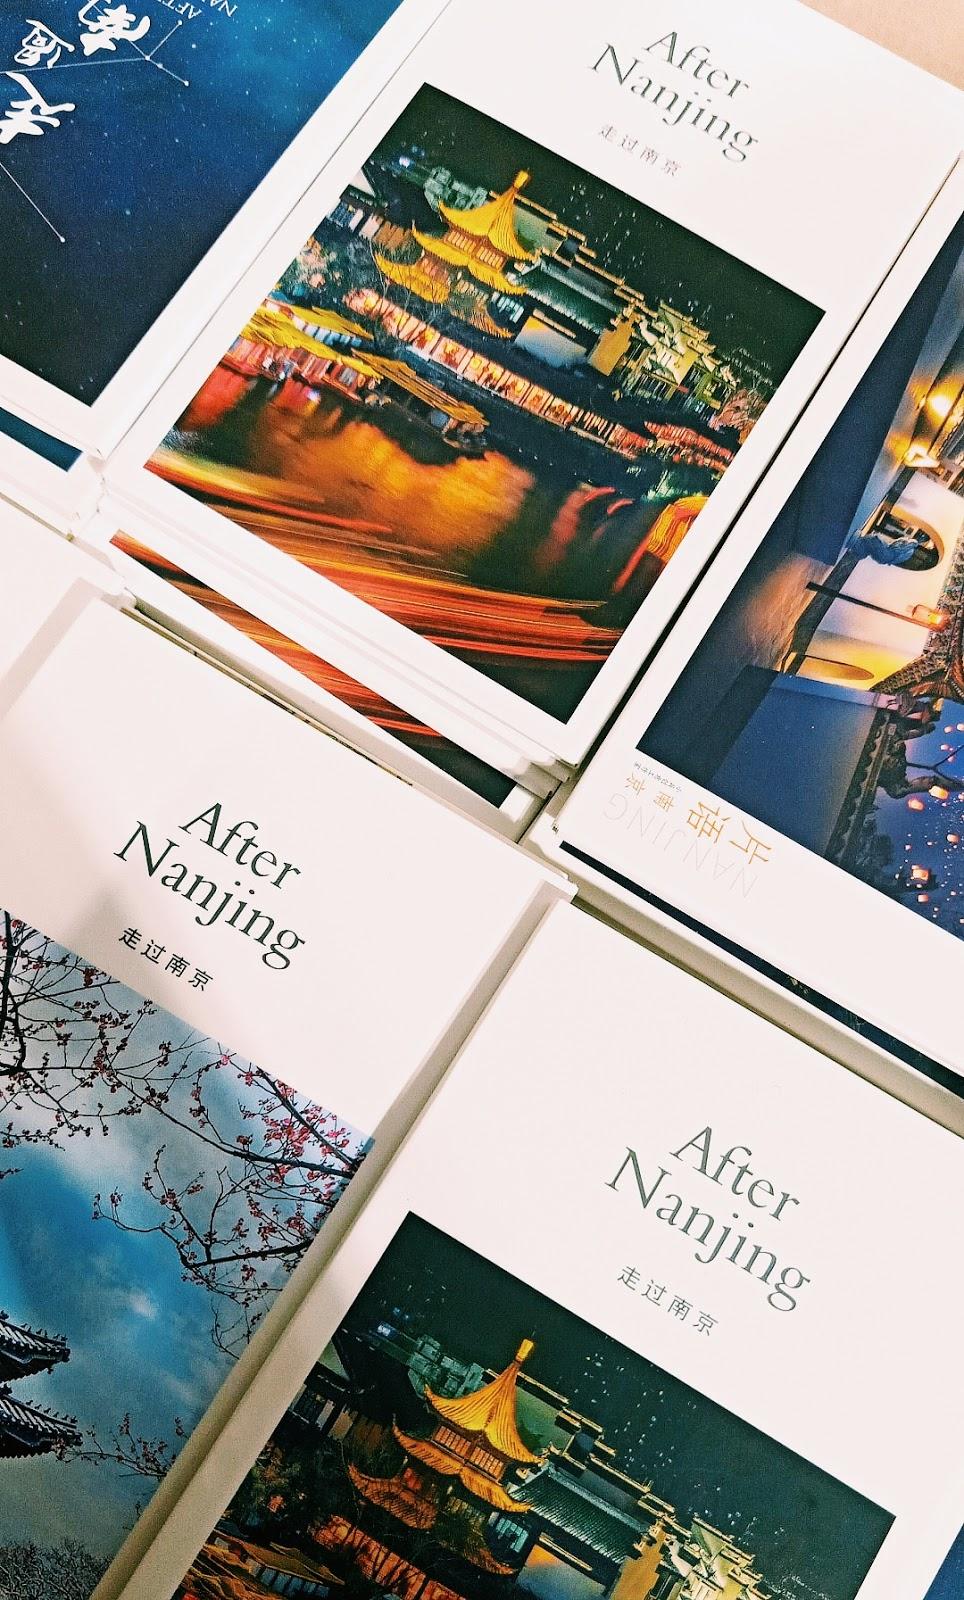 Nanjing, and Its memories